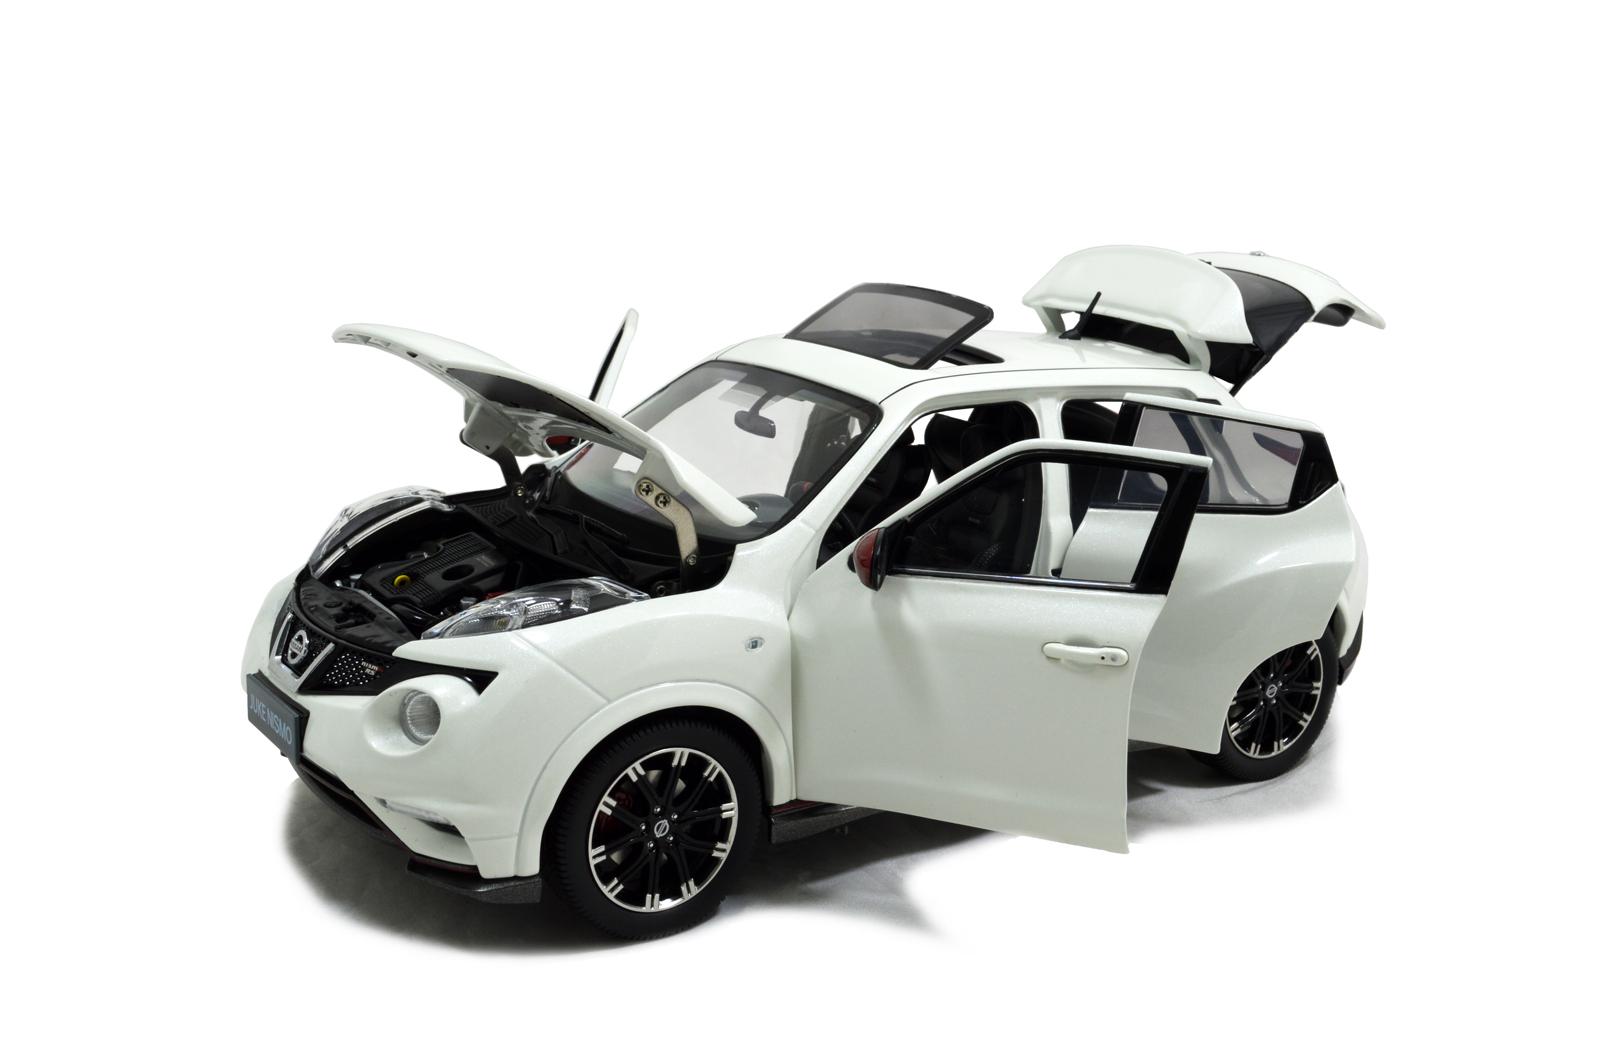 Nissan Juke Nismo Rs 2014 1 18 Scale Diecast Model Car